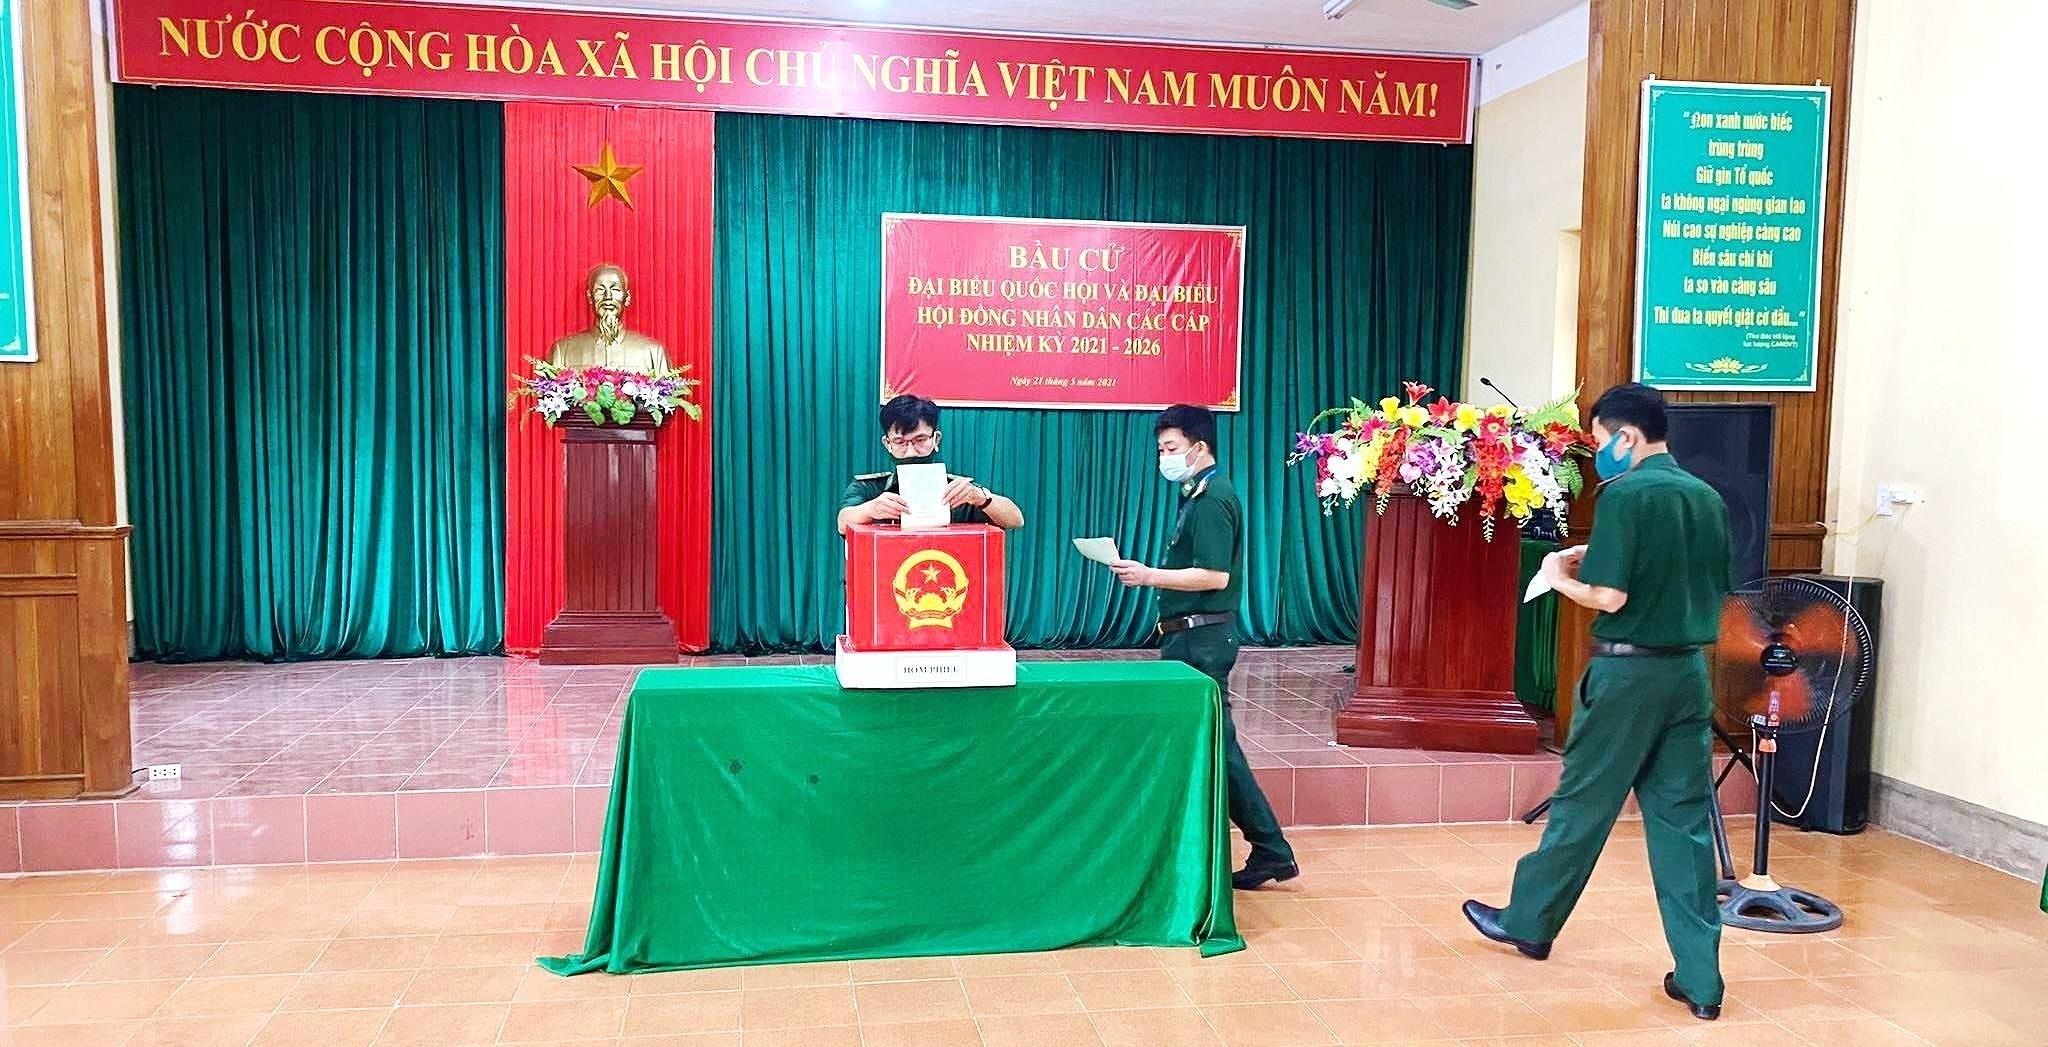 Hinh anh cu tri bau cu som tai Quang Binh, Ca Mau, Hau Giang, Nghe An hinh anh 10